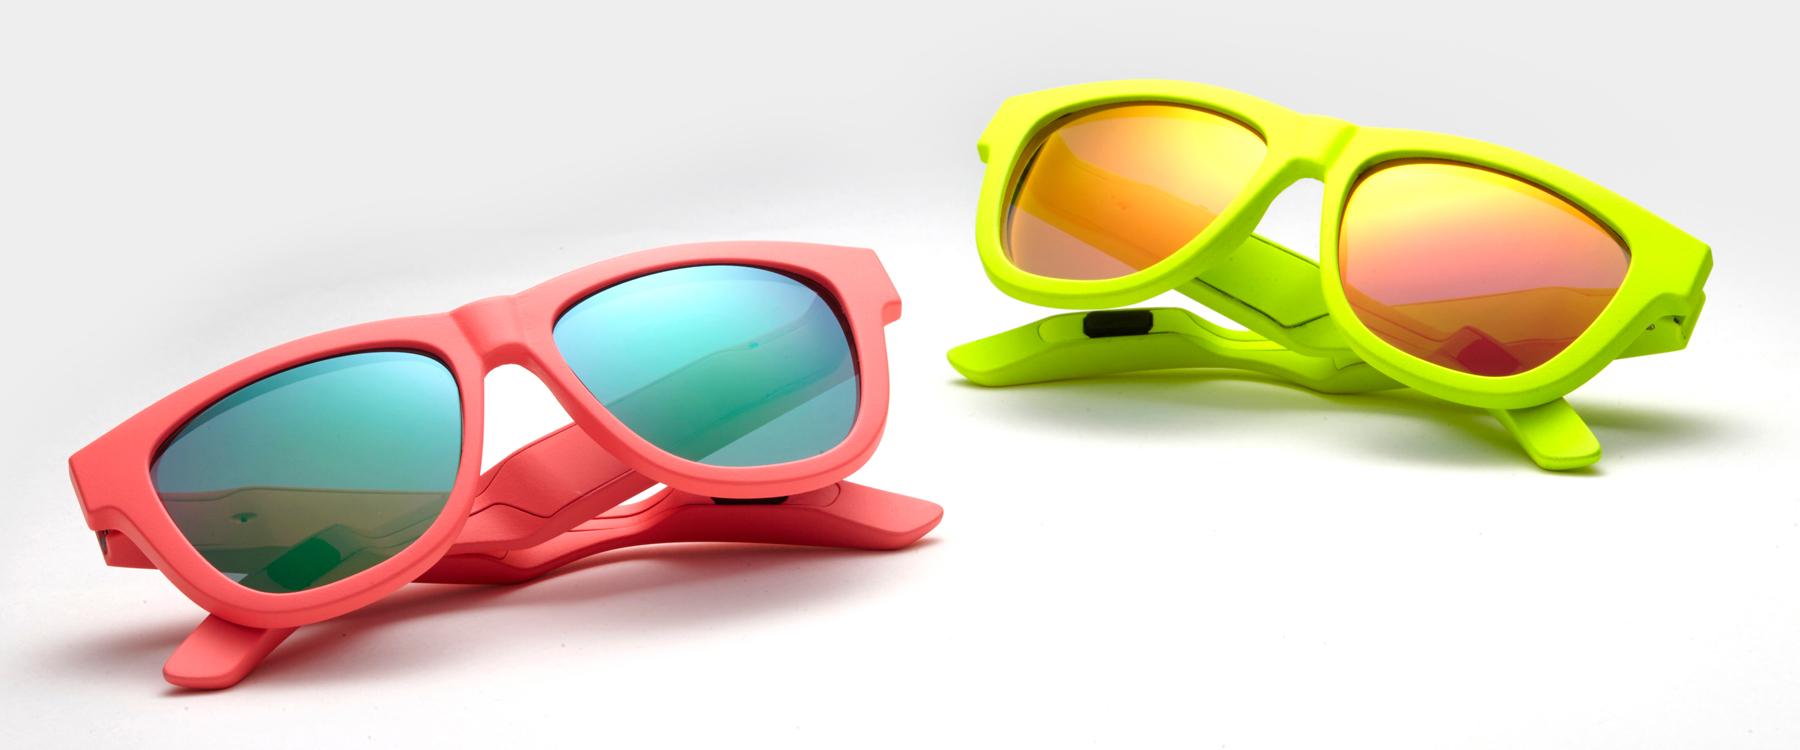 zungle-panther-sunglasses-headphones-designboom-header